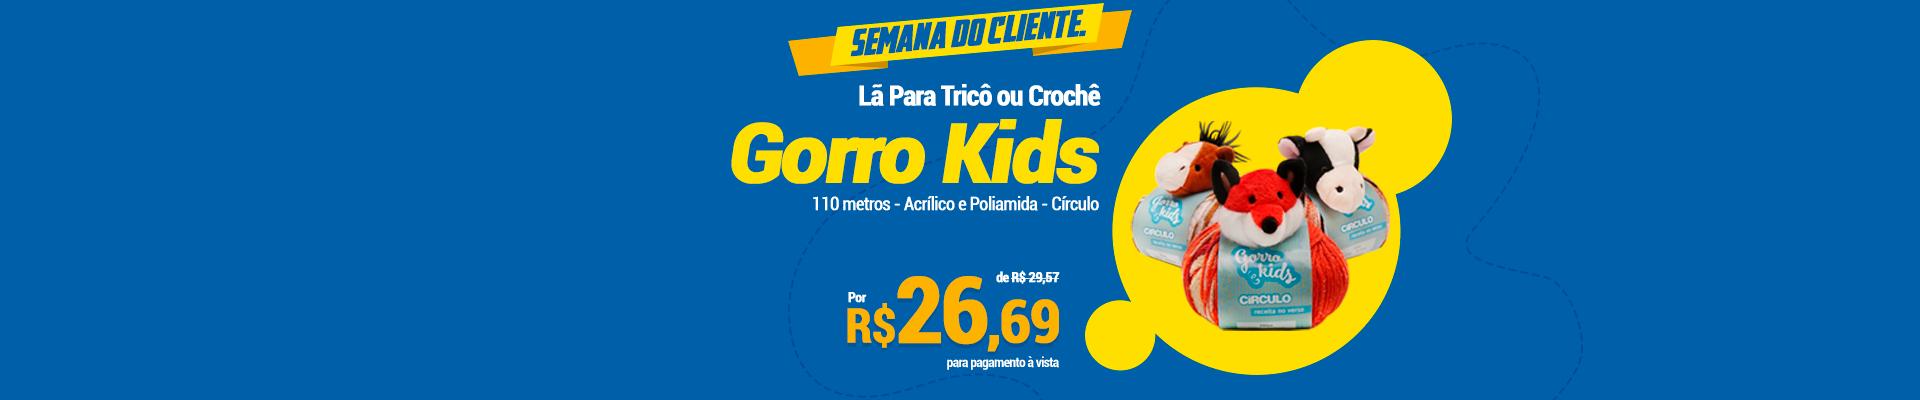 Semana Cliente Gorro Kids Circulo